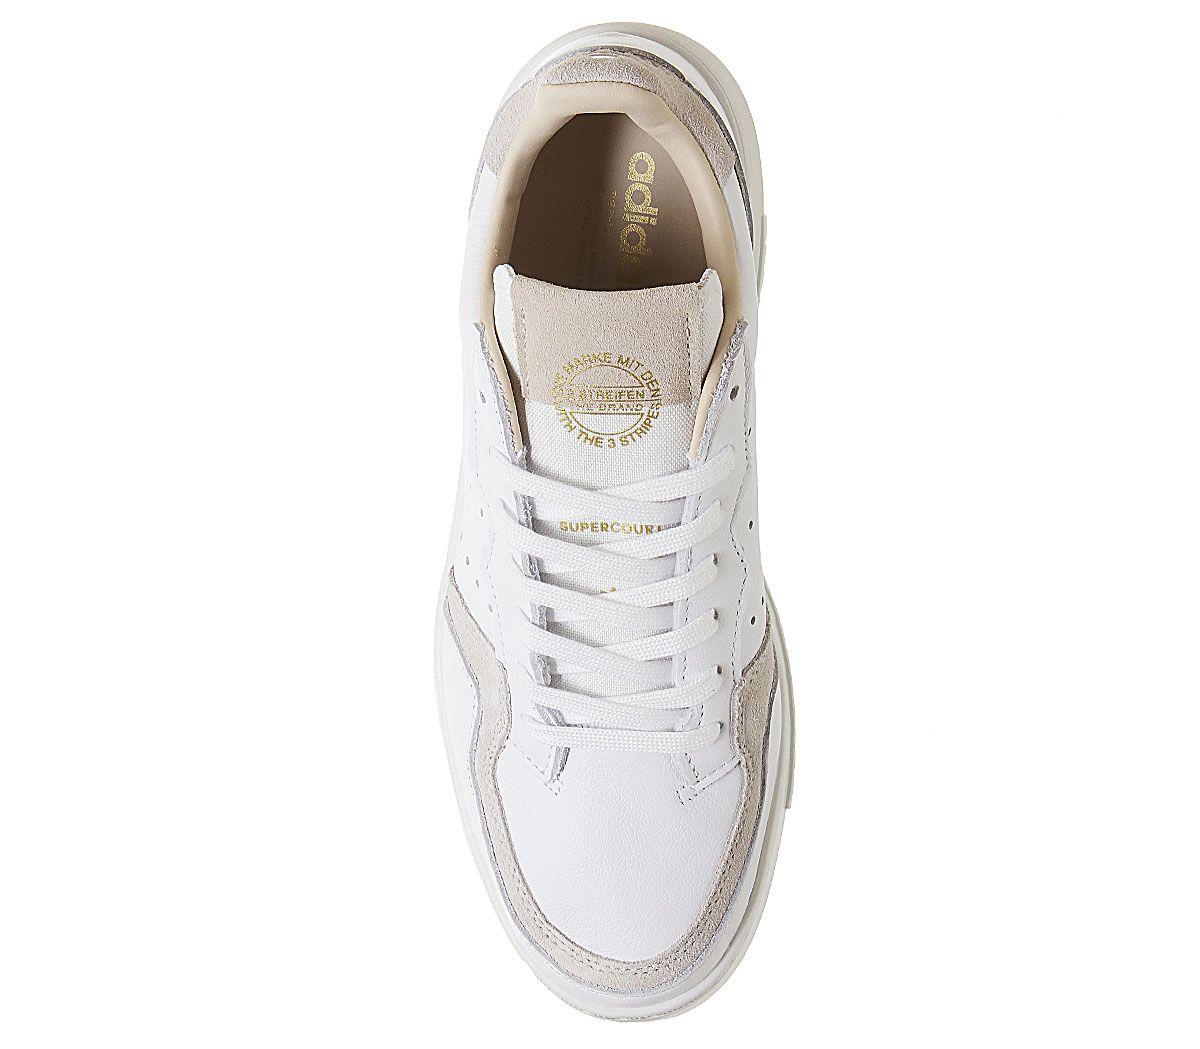 Adidas-Supercourt-Baskets-Blanc-Cristal-Blanc-Baskets-Chaussures miniature 5